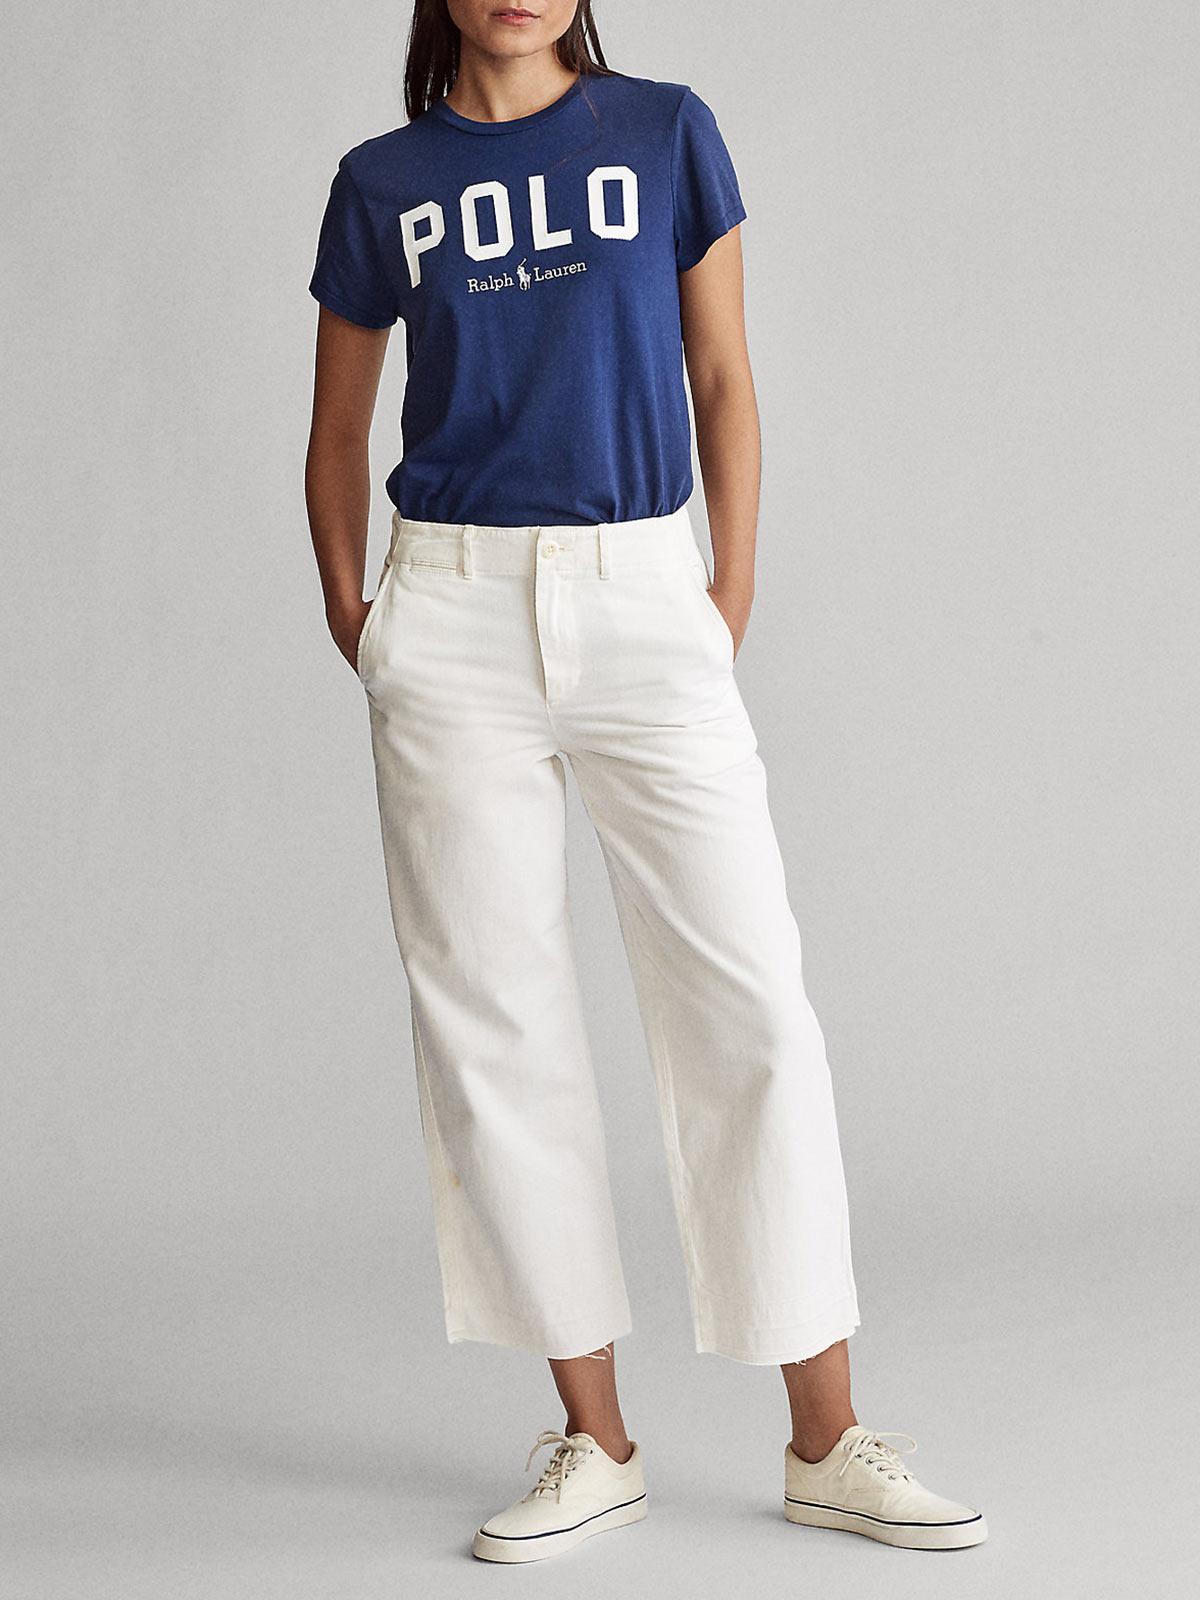 Picture of POLO RALPH LAUREN | Women's Polo Cotton T-shirt